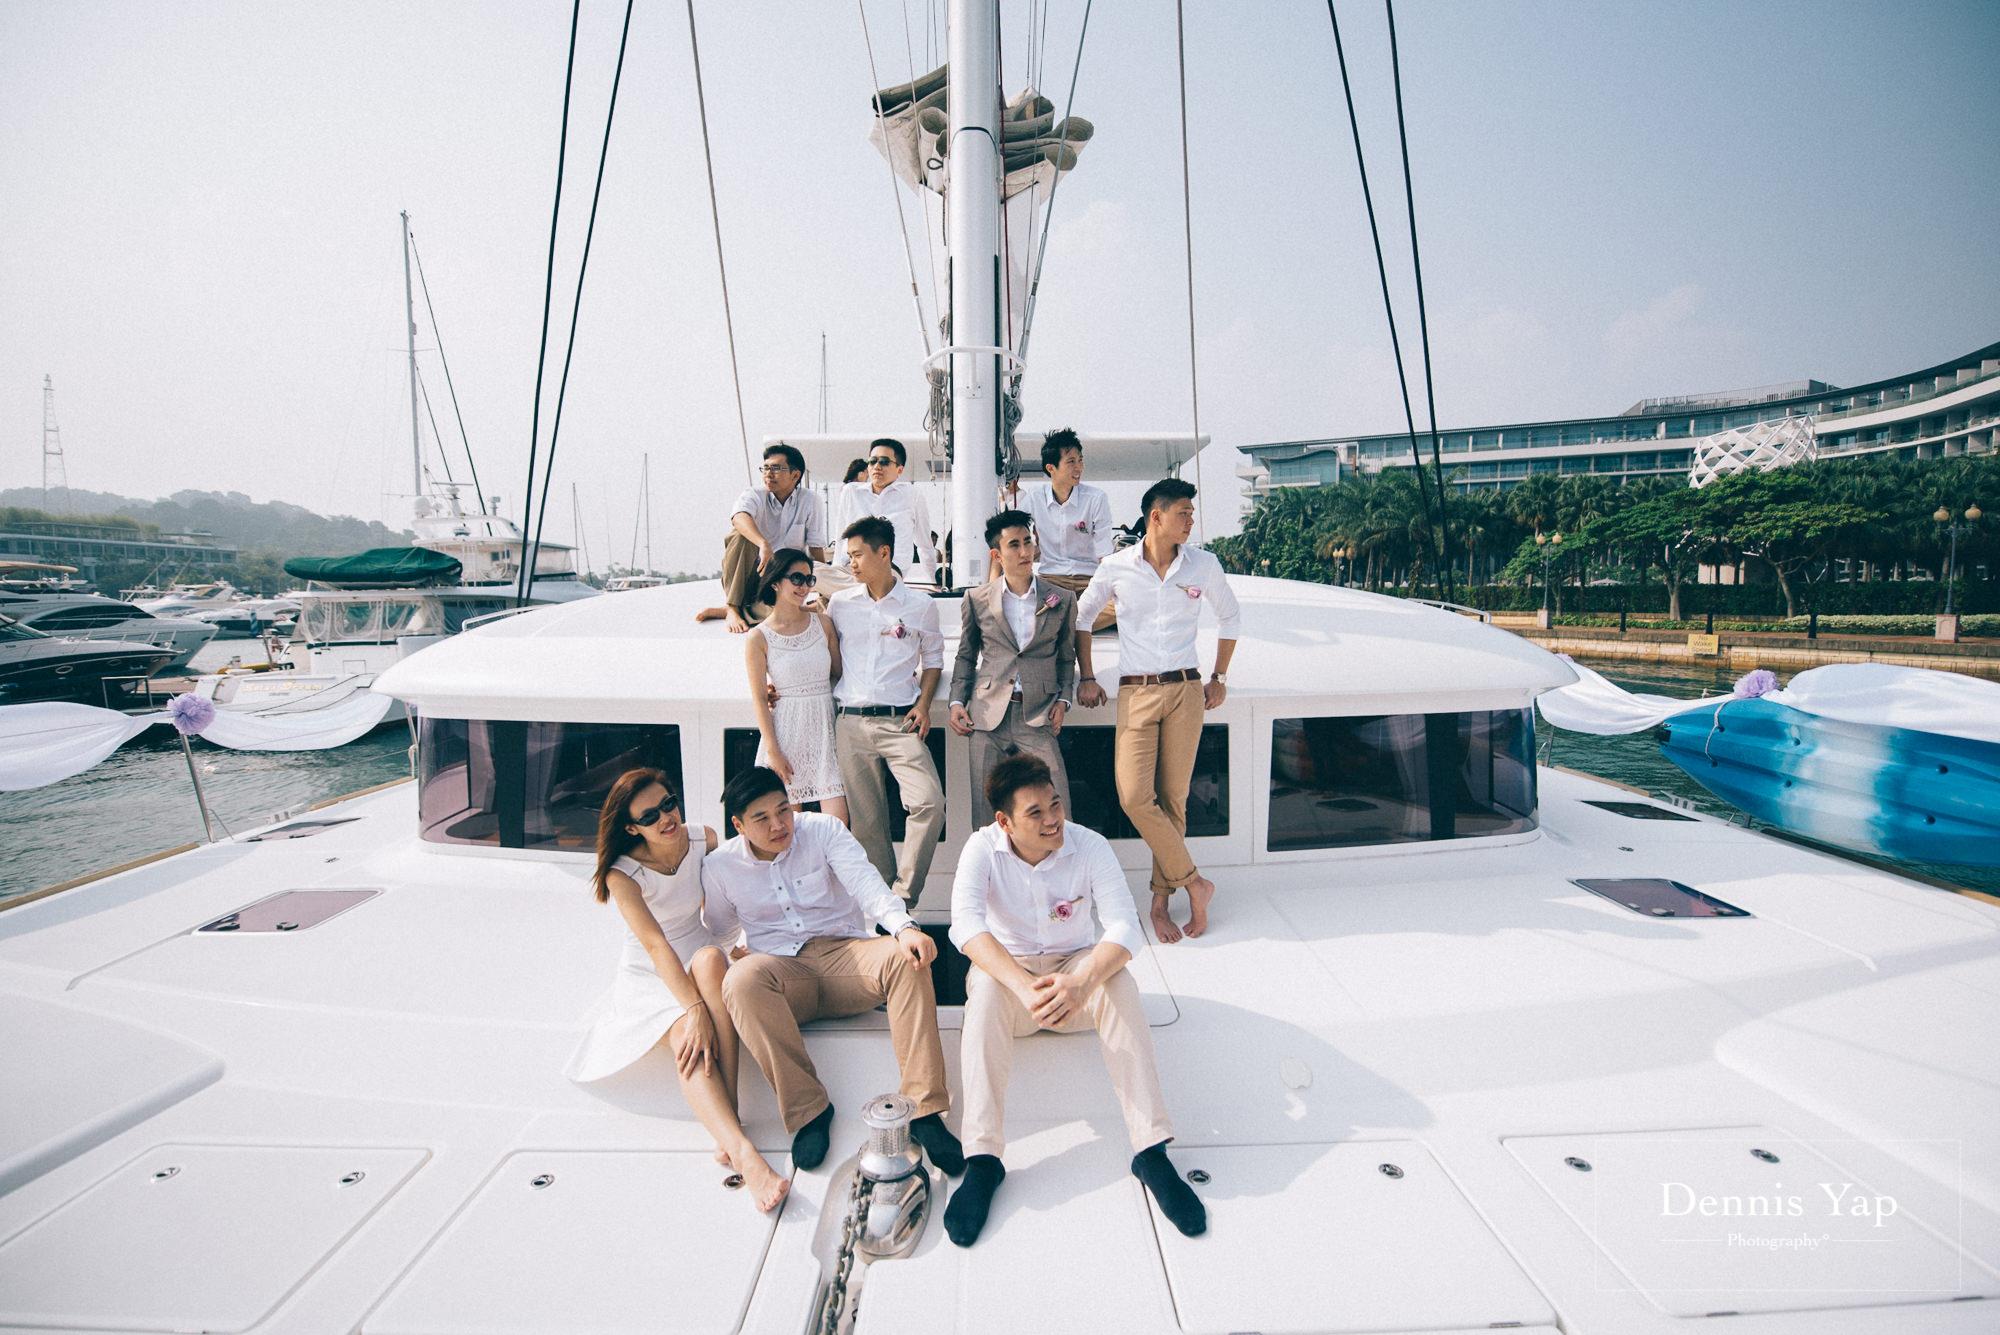 danny sherine wedding reception registration of marriage yacht fun beloved sea dennis yap photography malaysia top wedding photographer-25.jpg